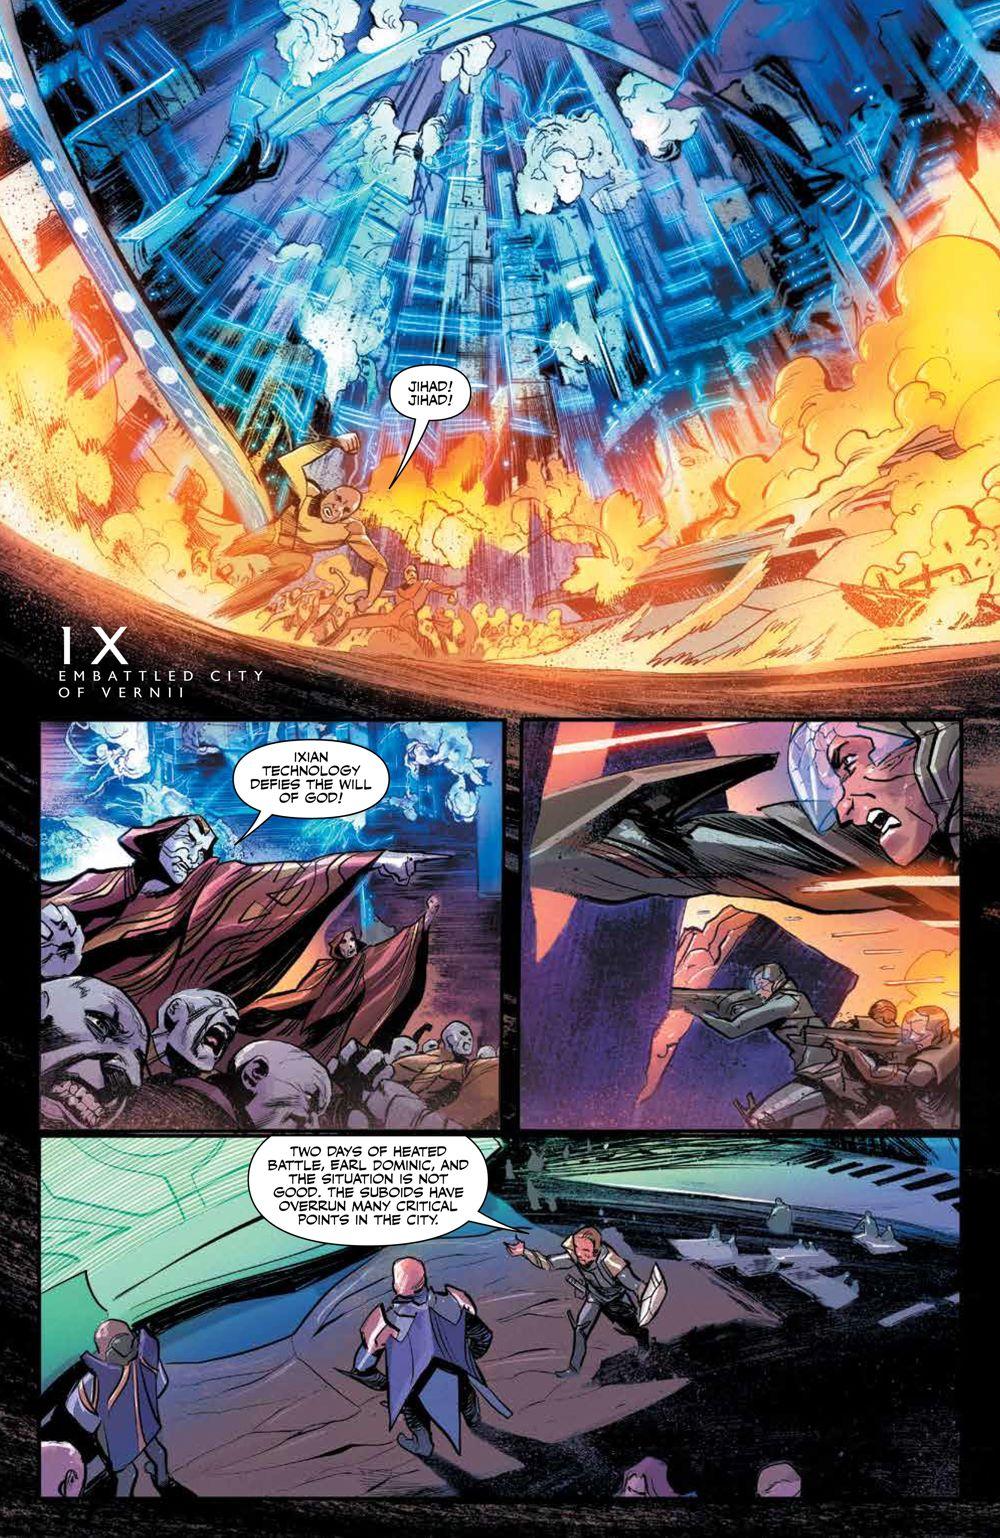 Dune_HouseAtreides_006_PRESS_3 ComicList Previews: DUNE HOUSE ATREIDES #6 (OF 12)